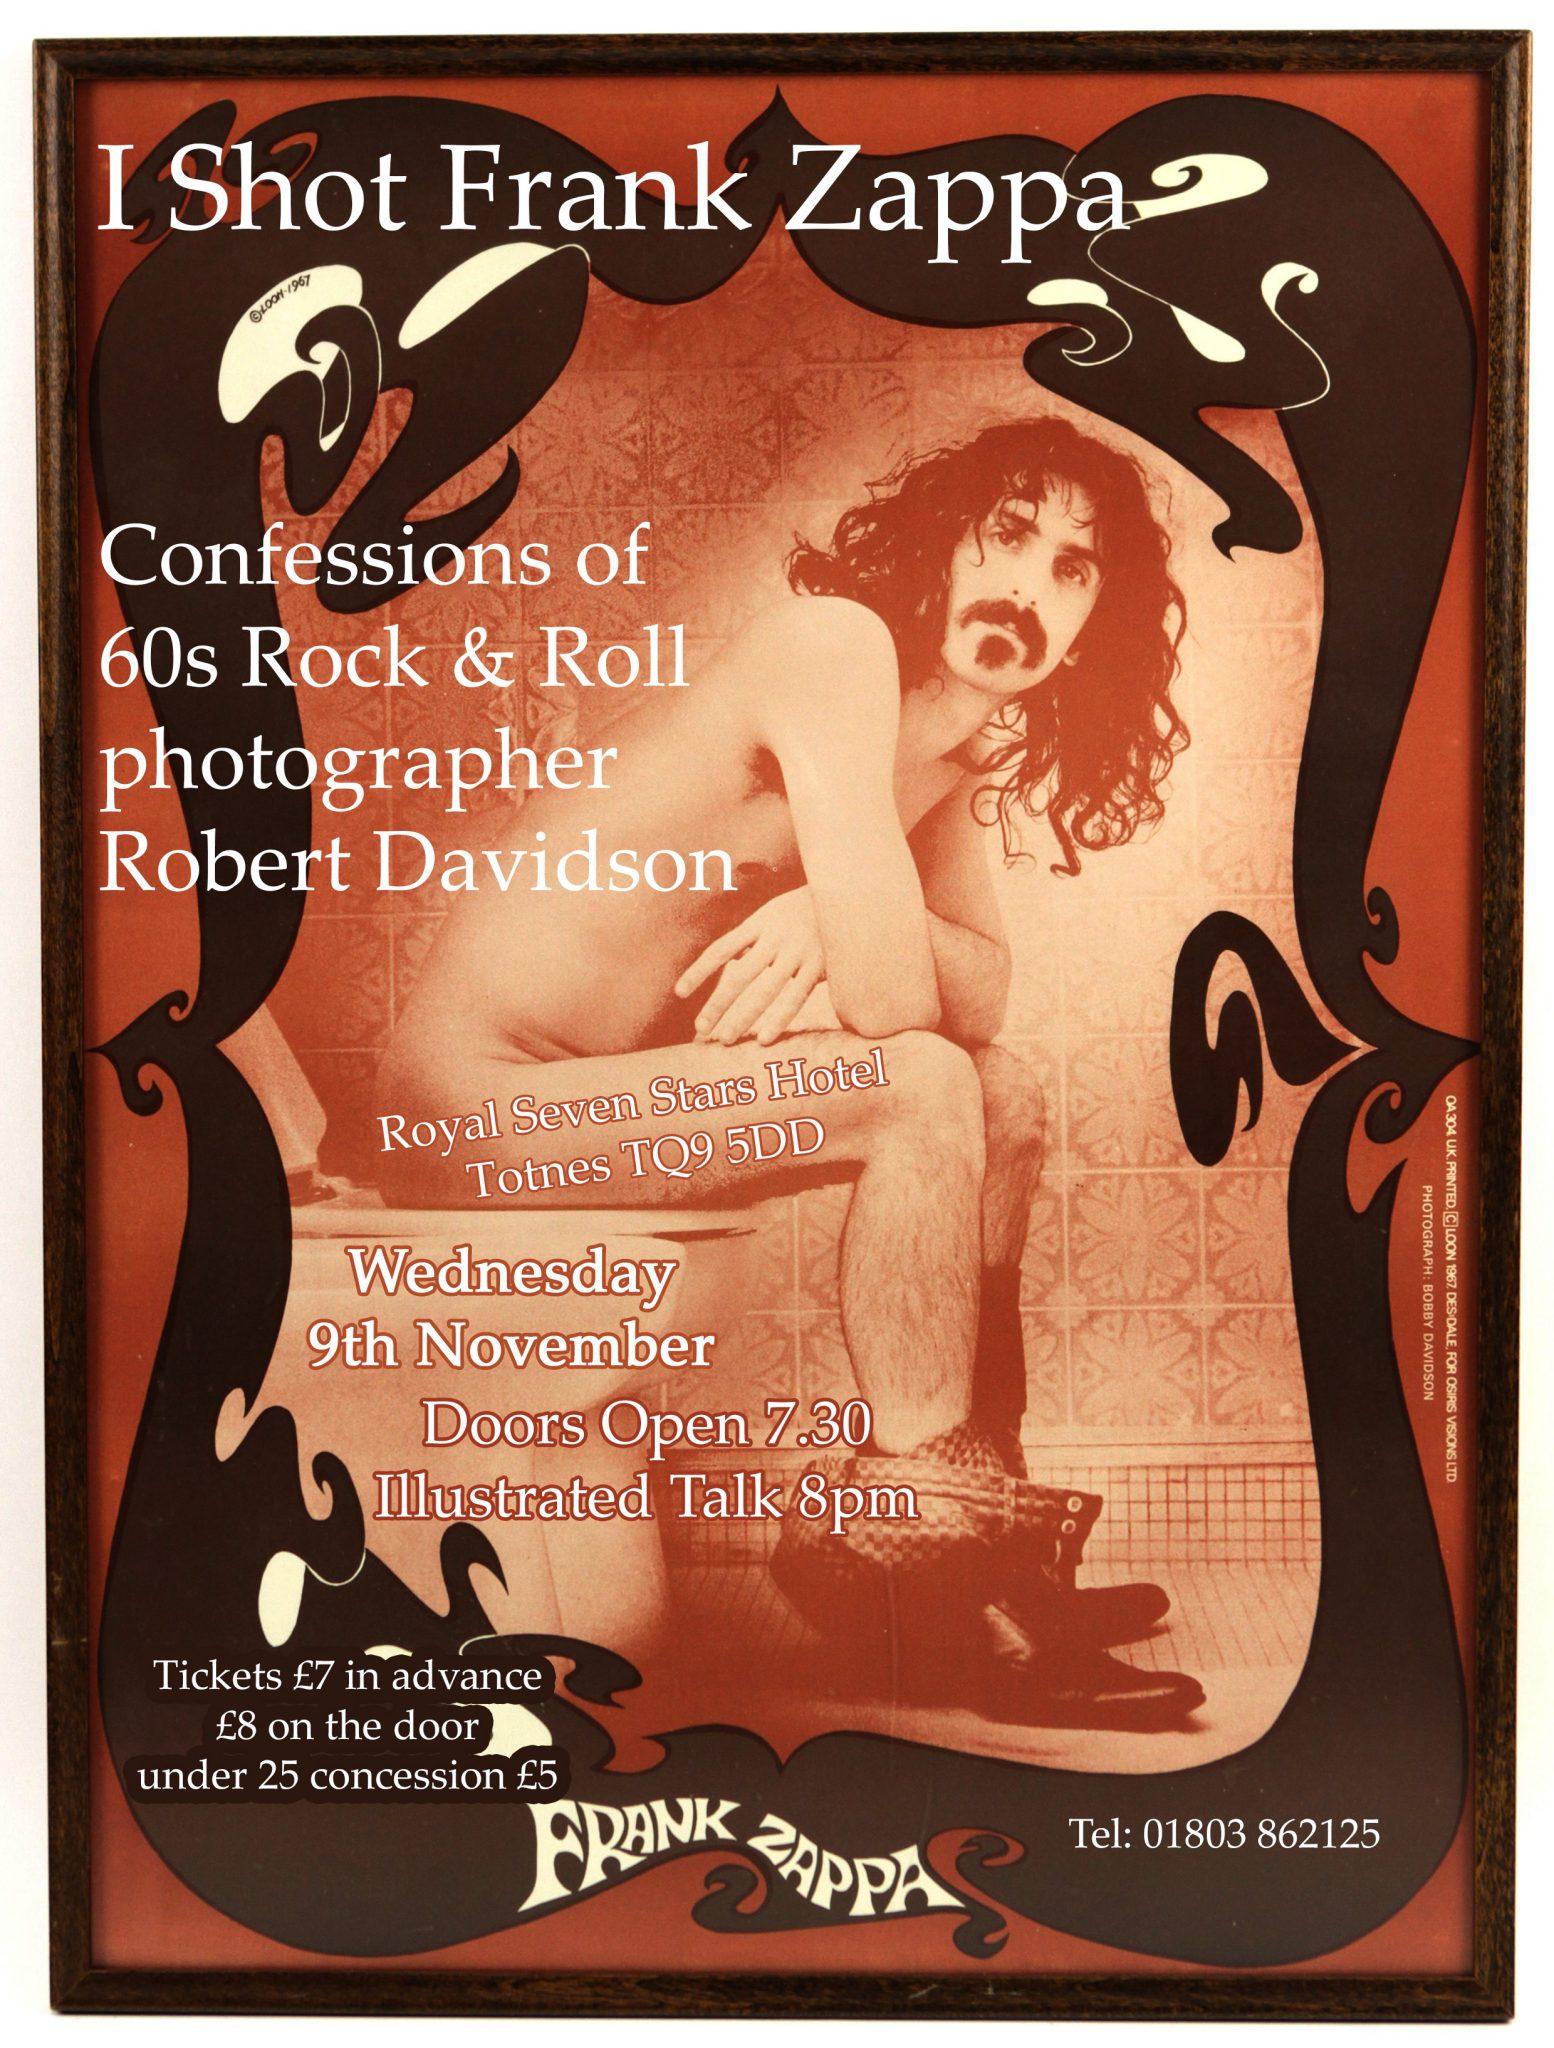 I Shot Frank Zappa: Illustrated Talk with photographer